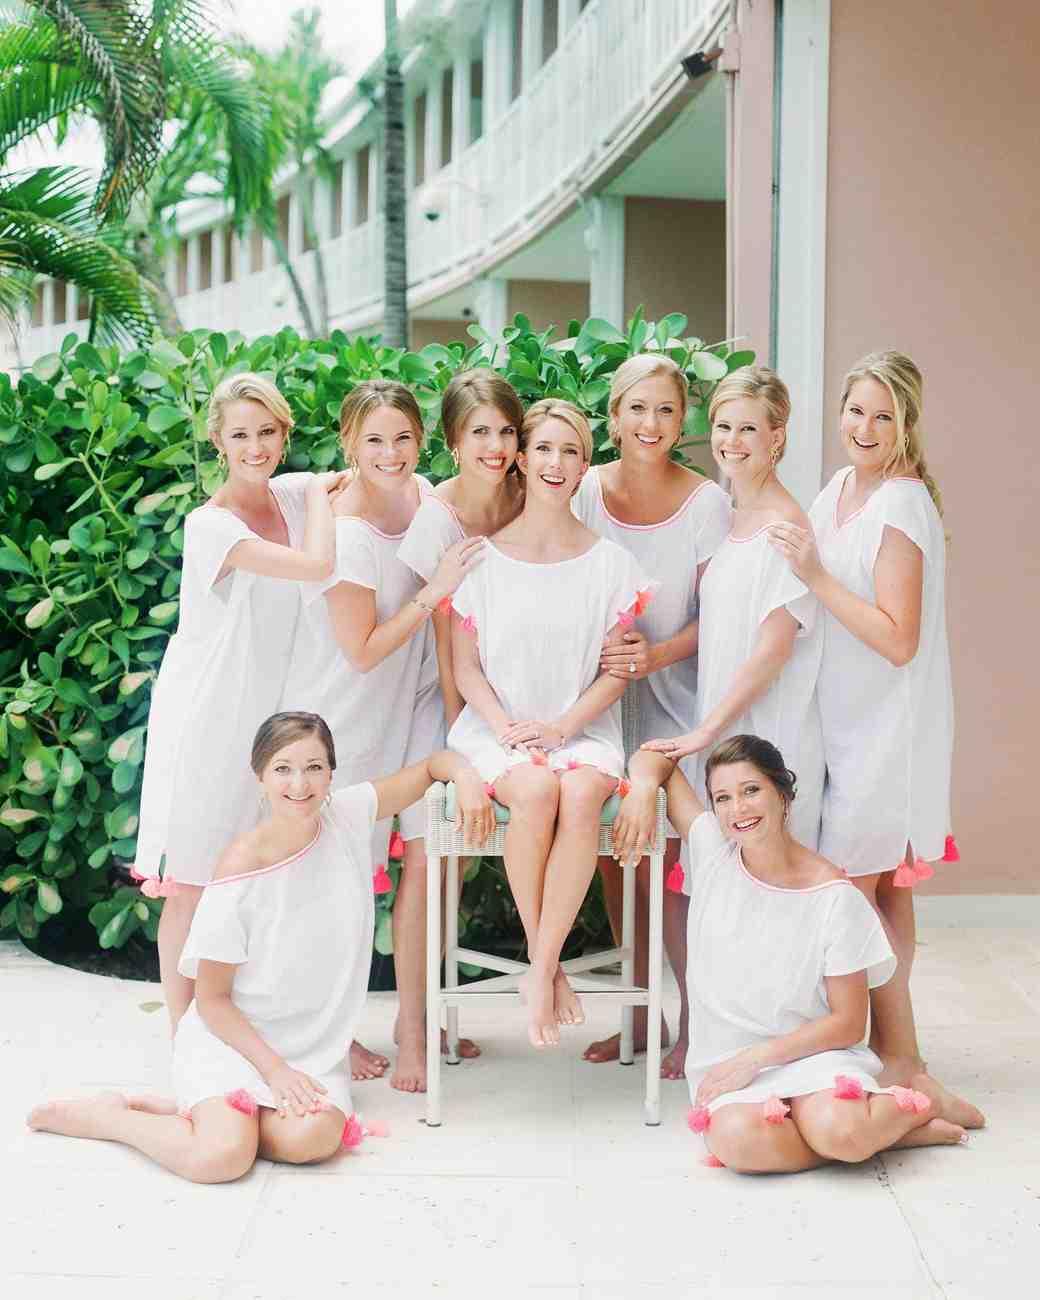 bridesmaids' robes alternatives